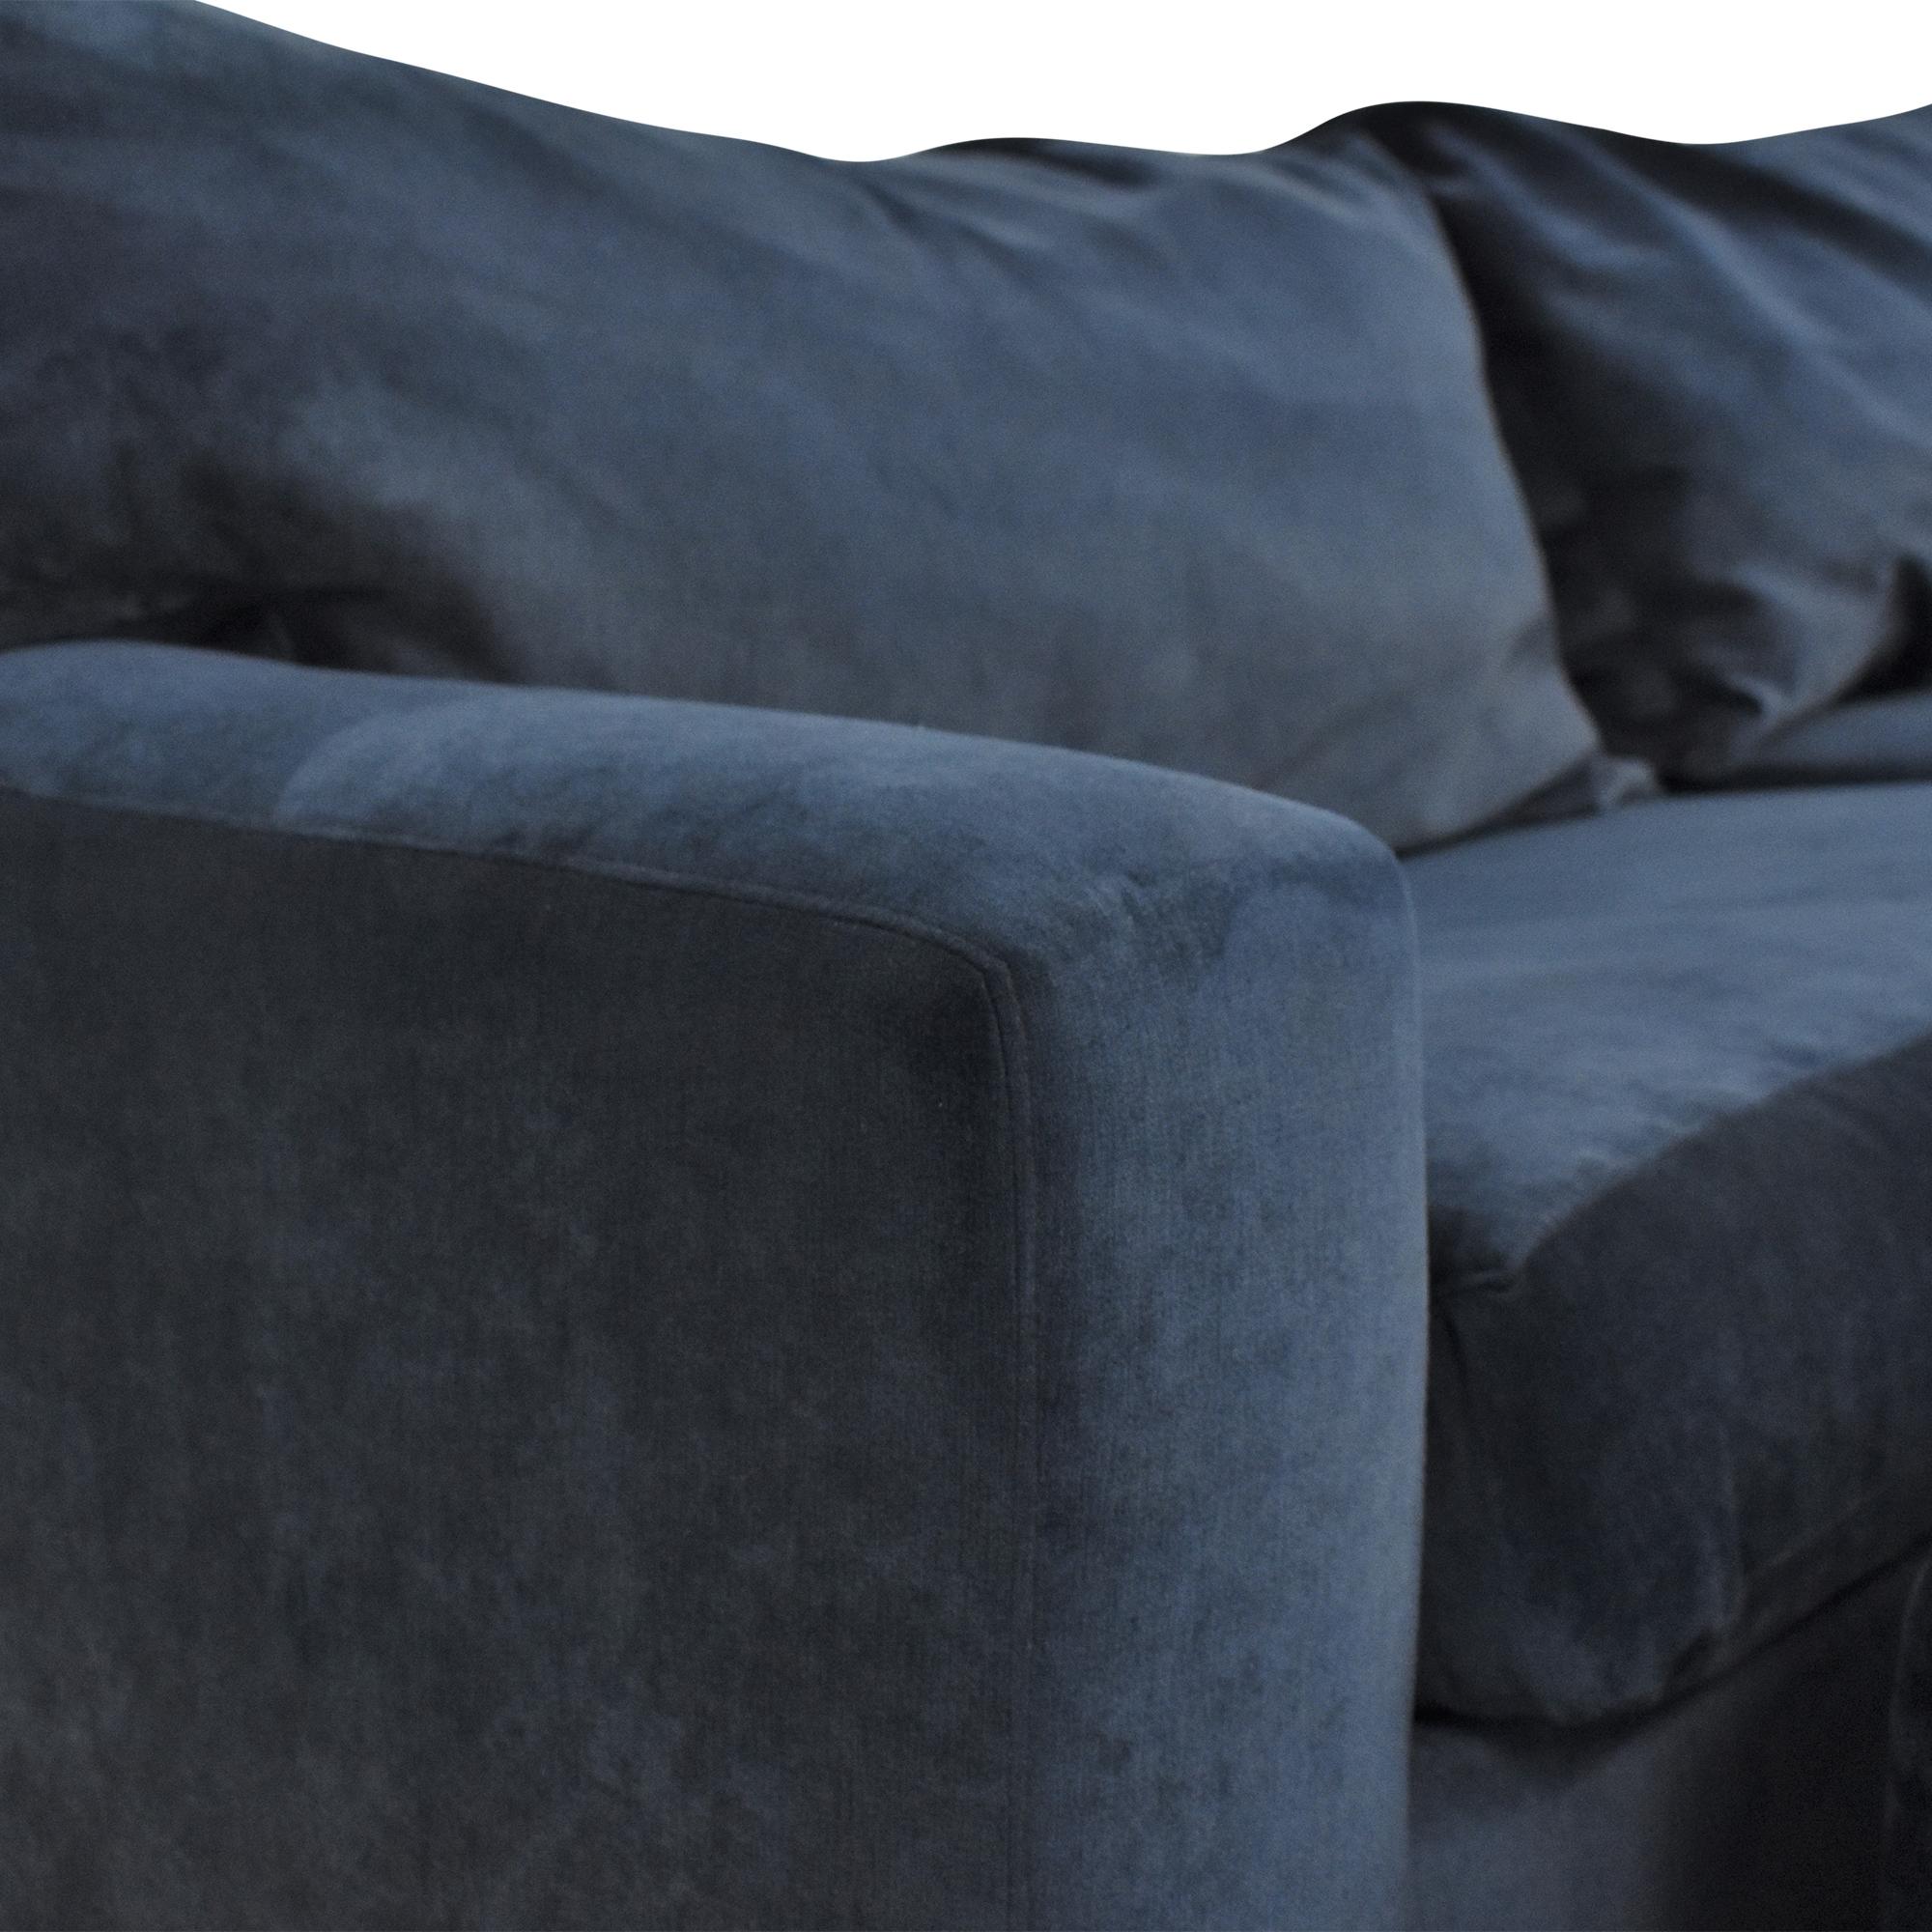 Mitchell Gold + Bob Williams Mitchell Gold + Bob Williams Sleeper Sofa & Ottoman nyc